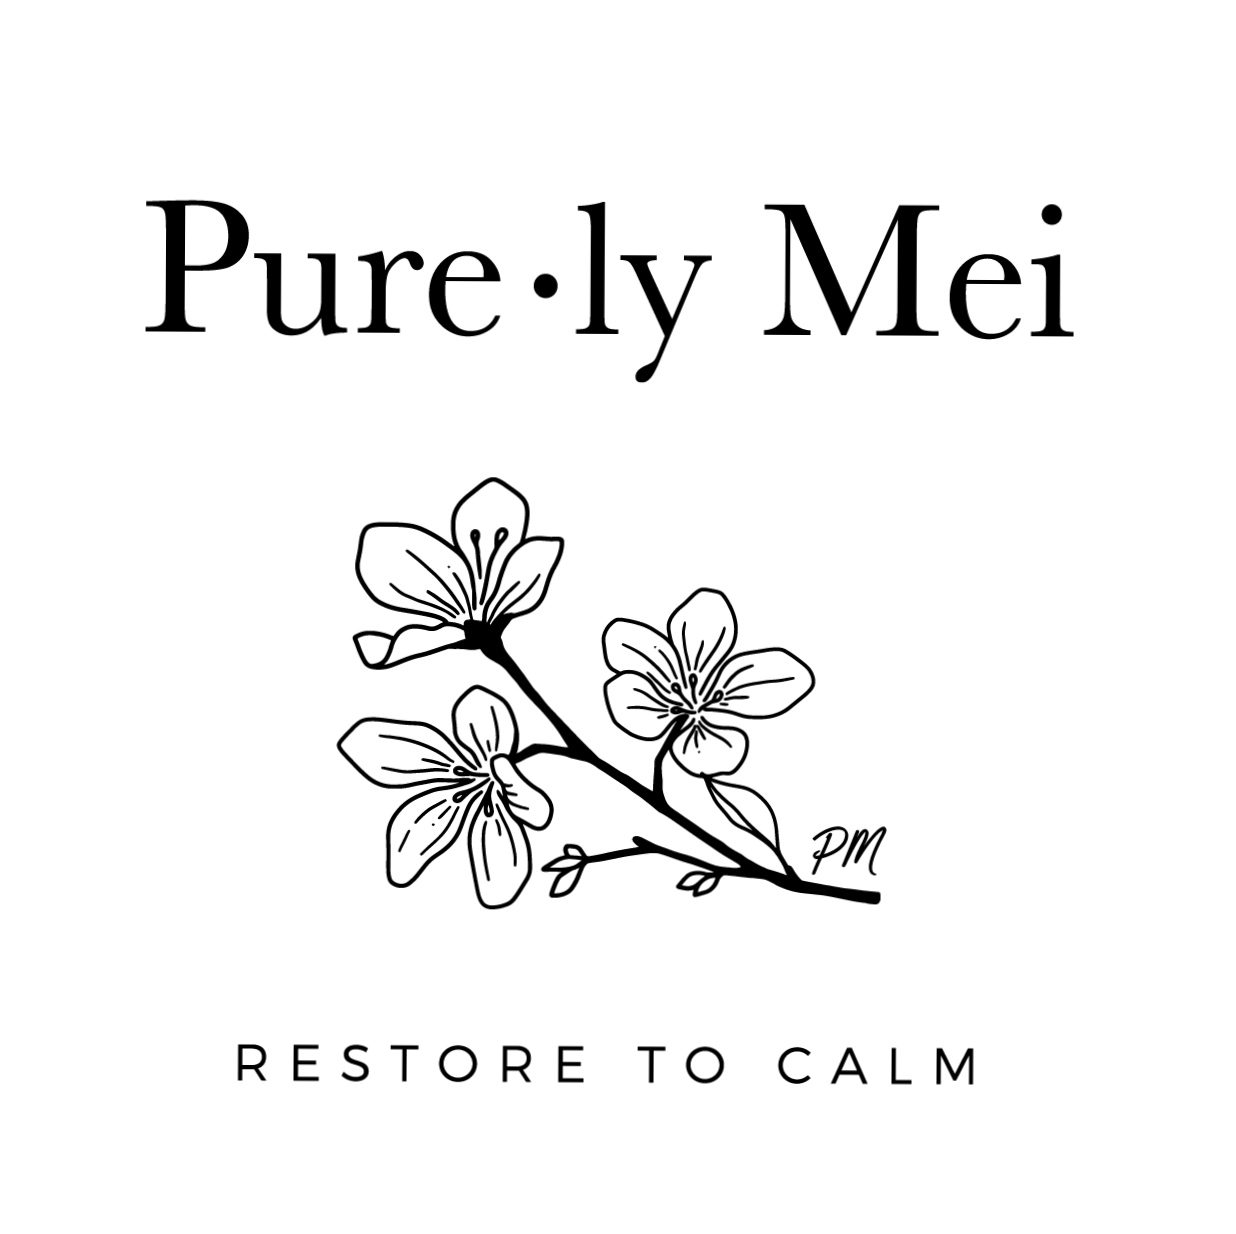 Purely Me logo